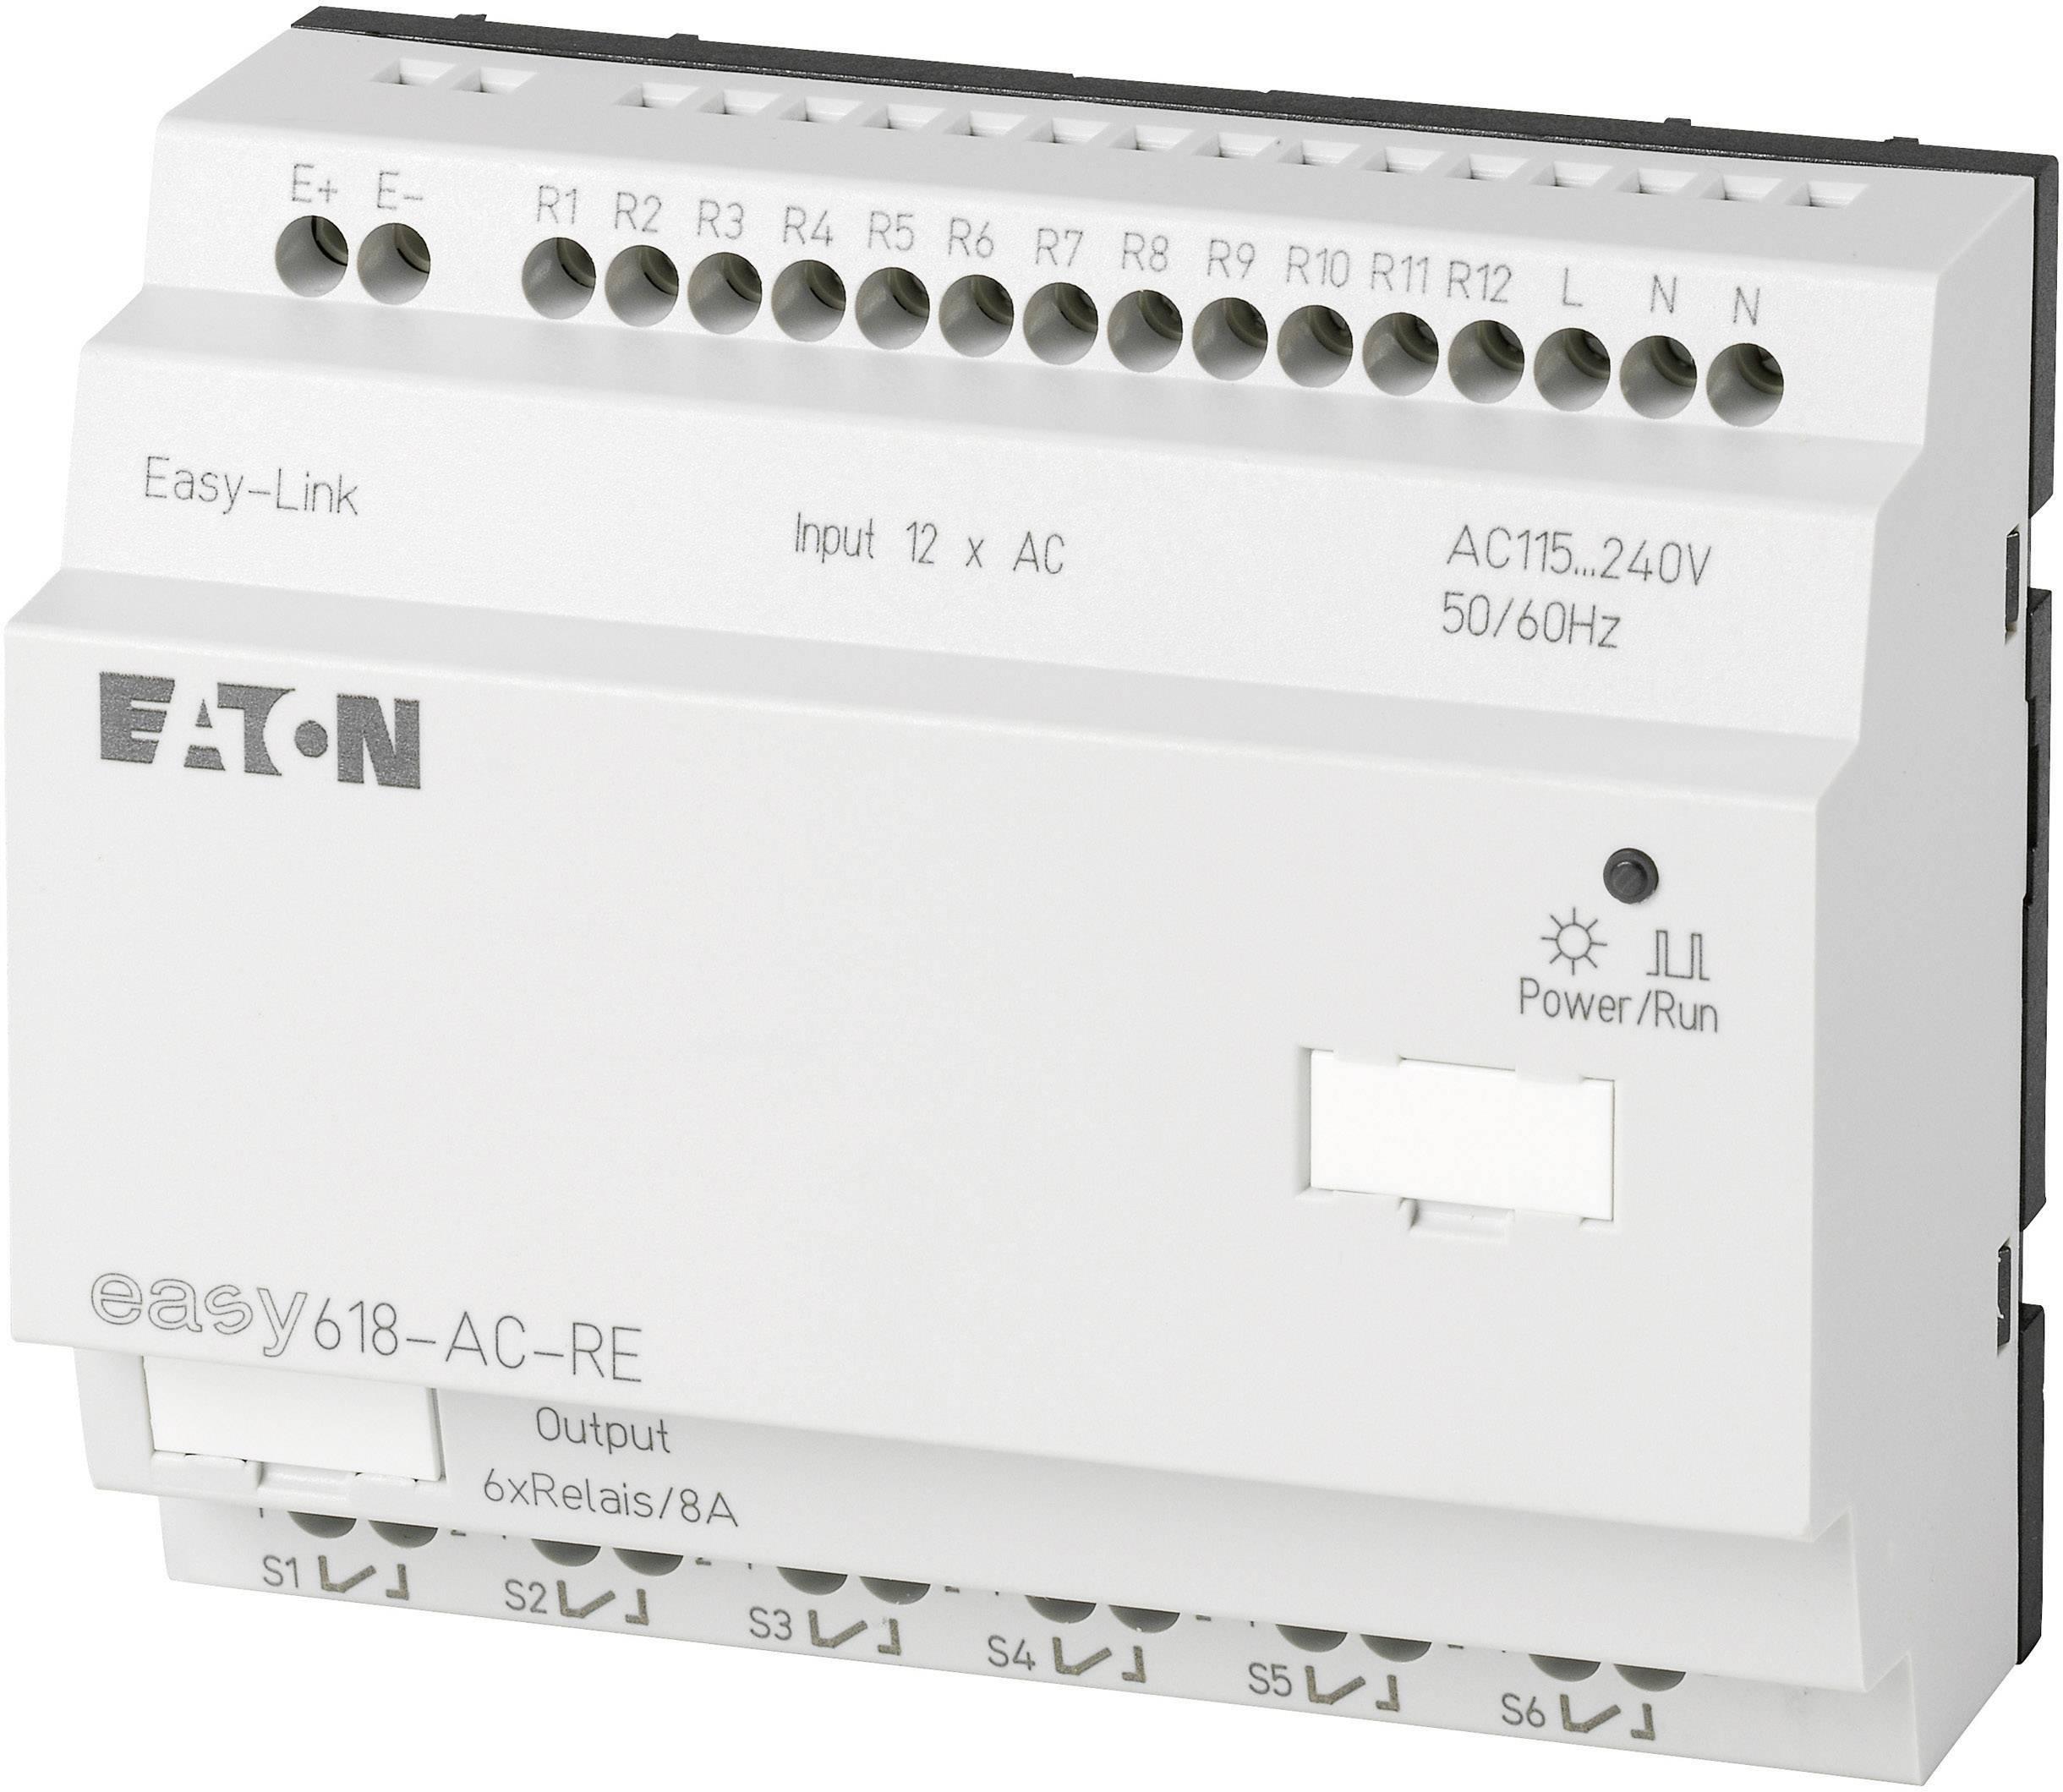 Riadiacimodul Eaton easy 618-AC-RE 212314, 115 V/AC, 230 V/AC